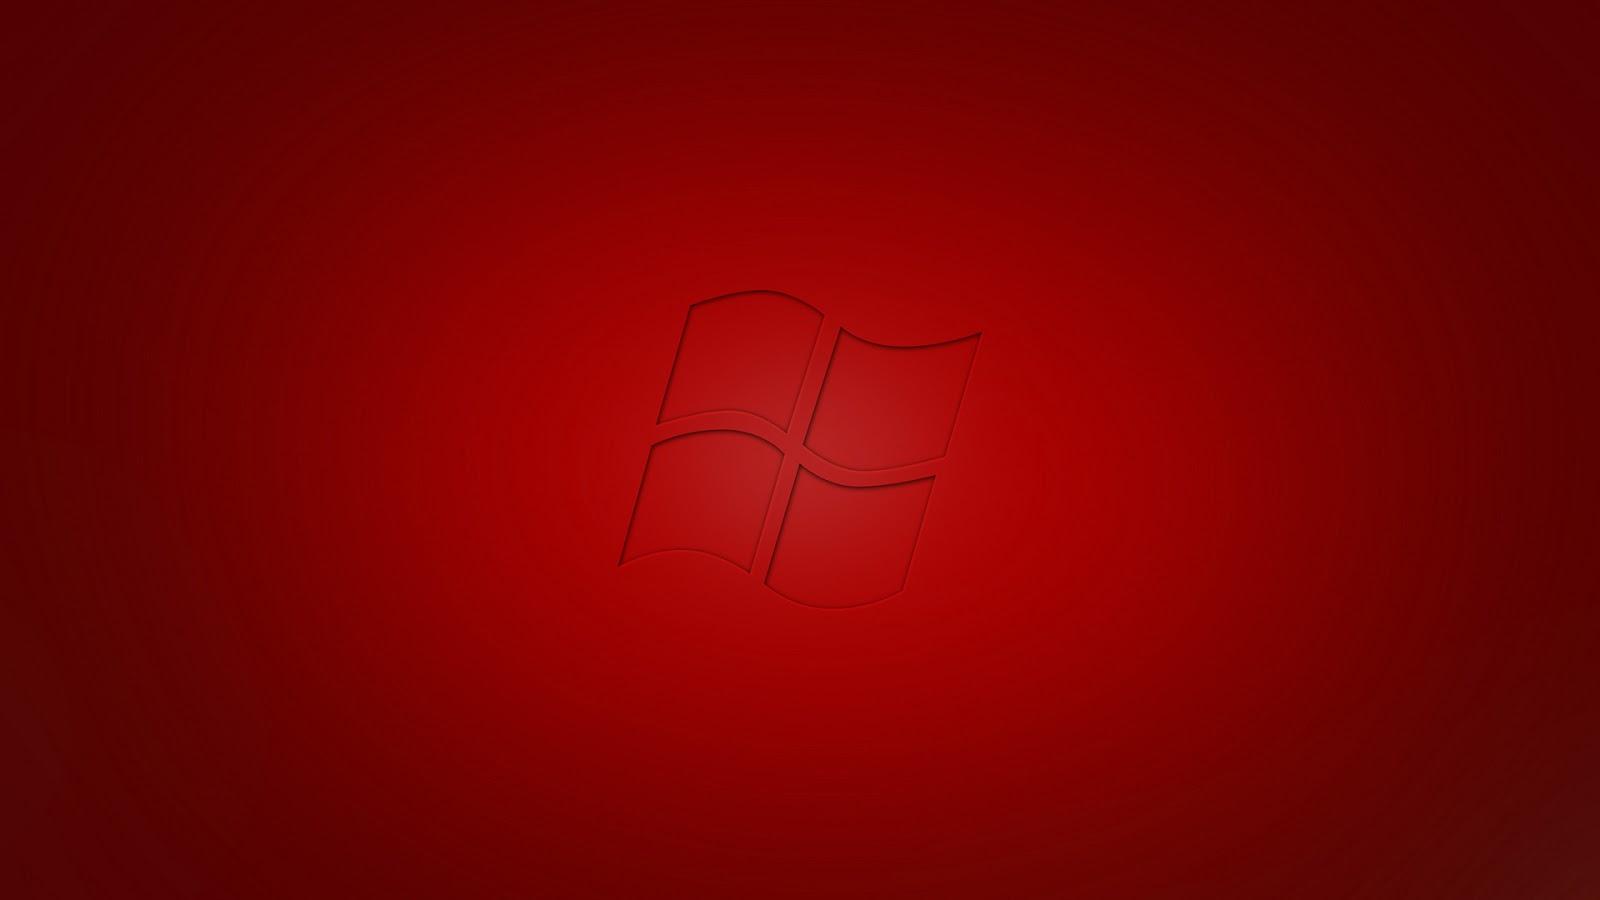 HD WALLPAPER Windows 8 HD Wallpaper 1080p 1600x900